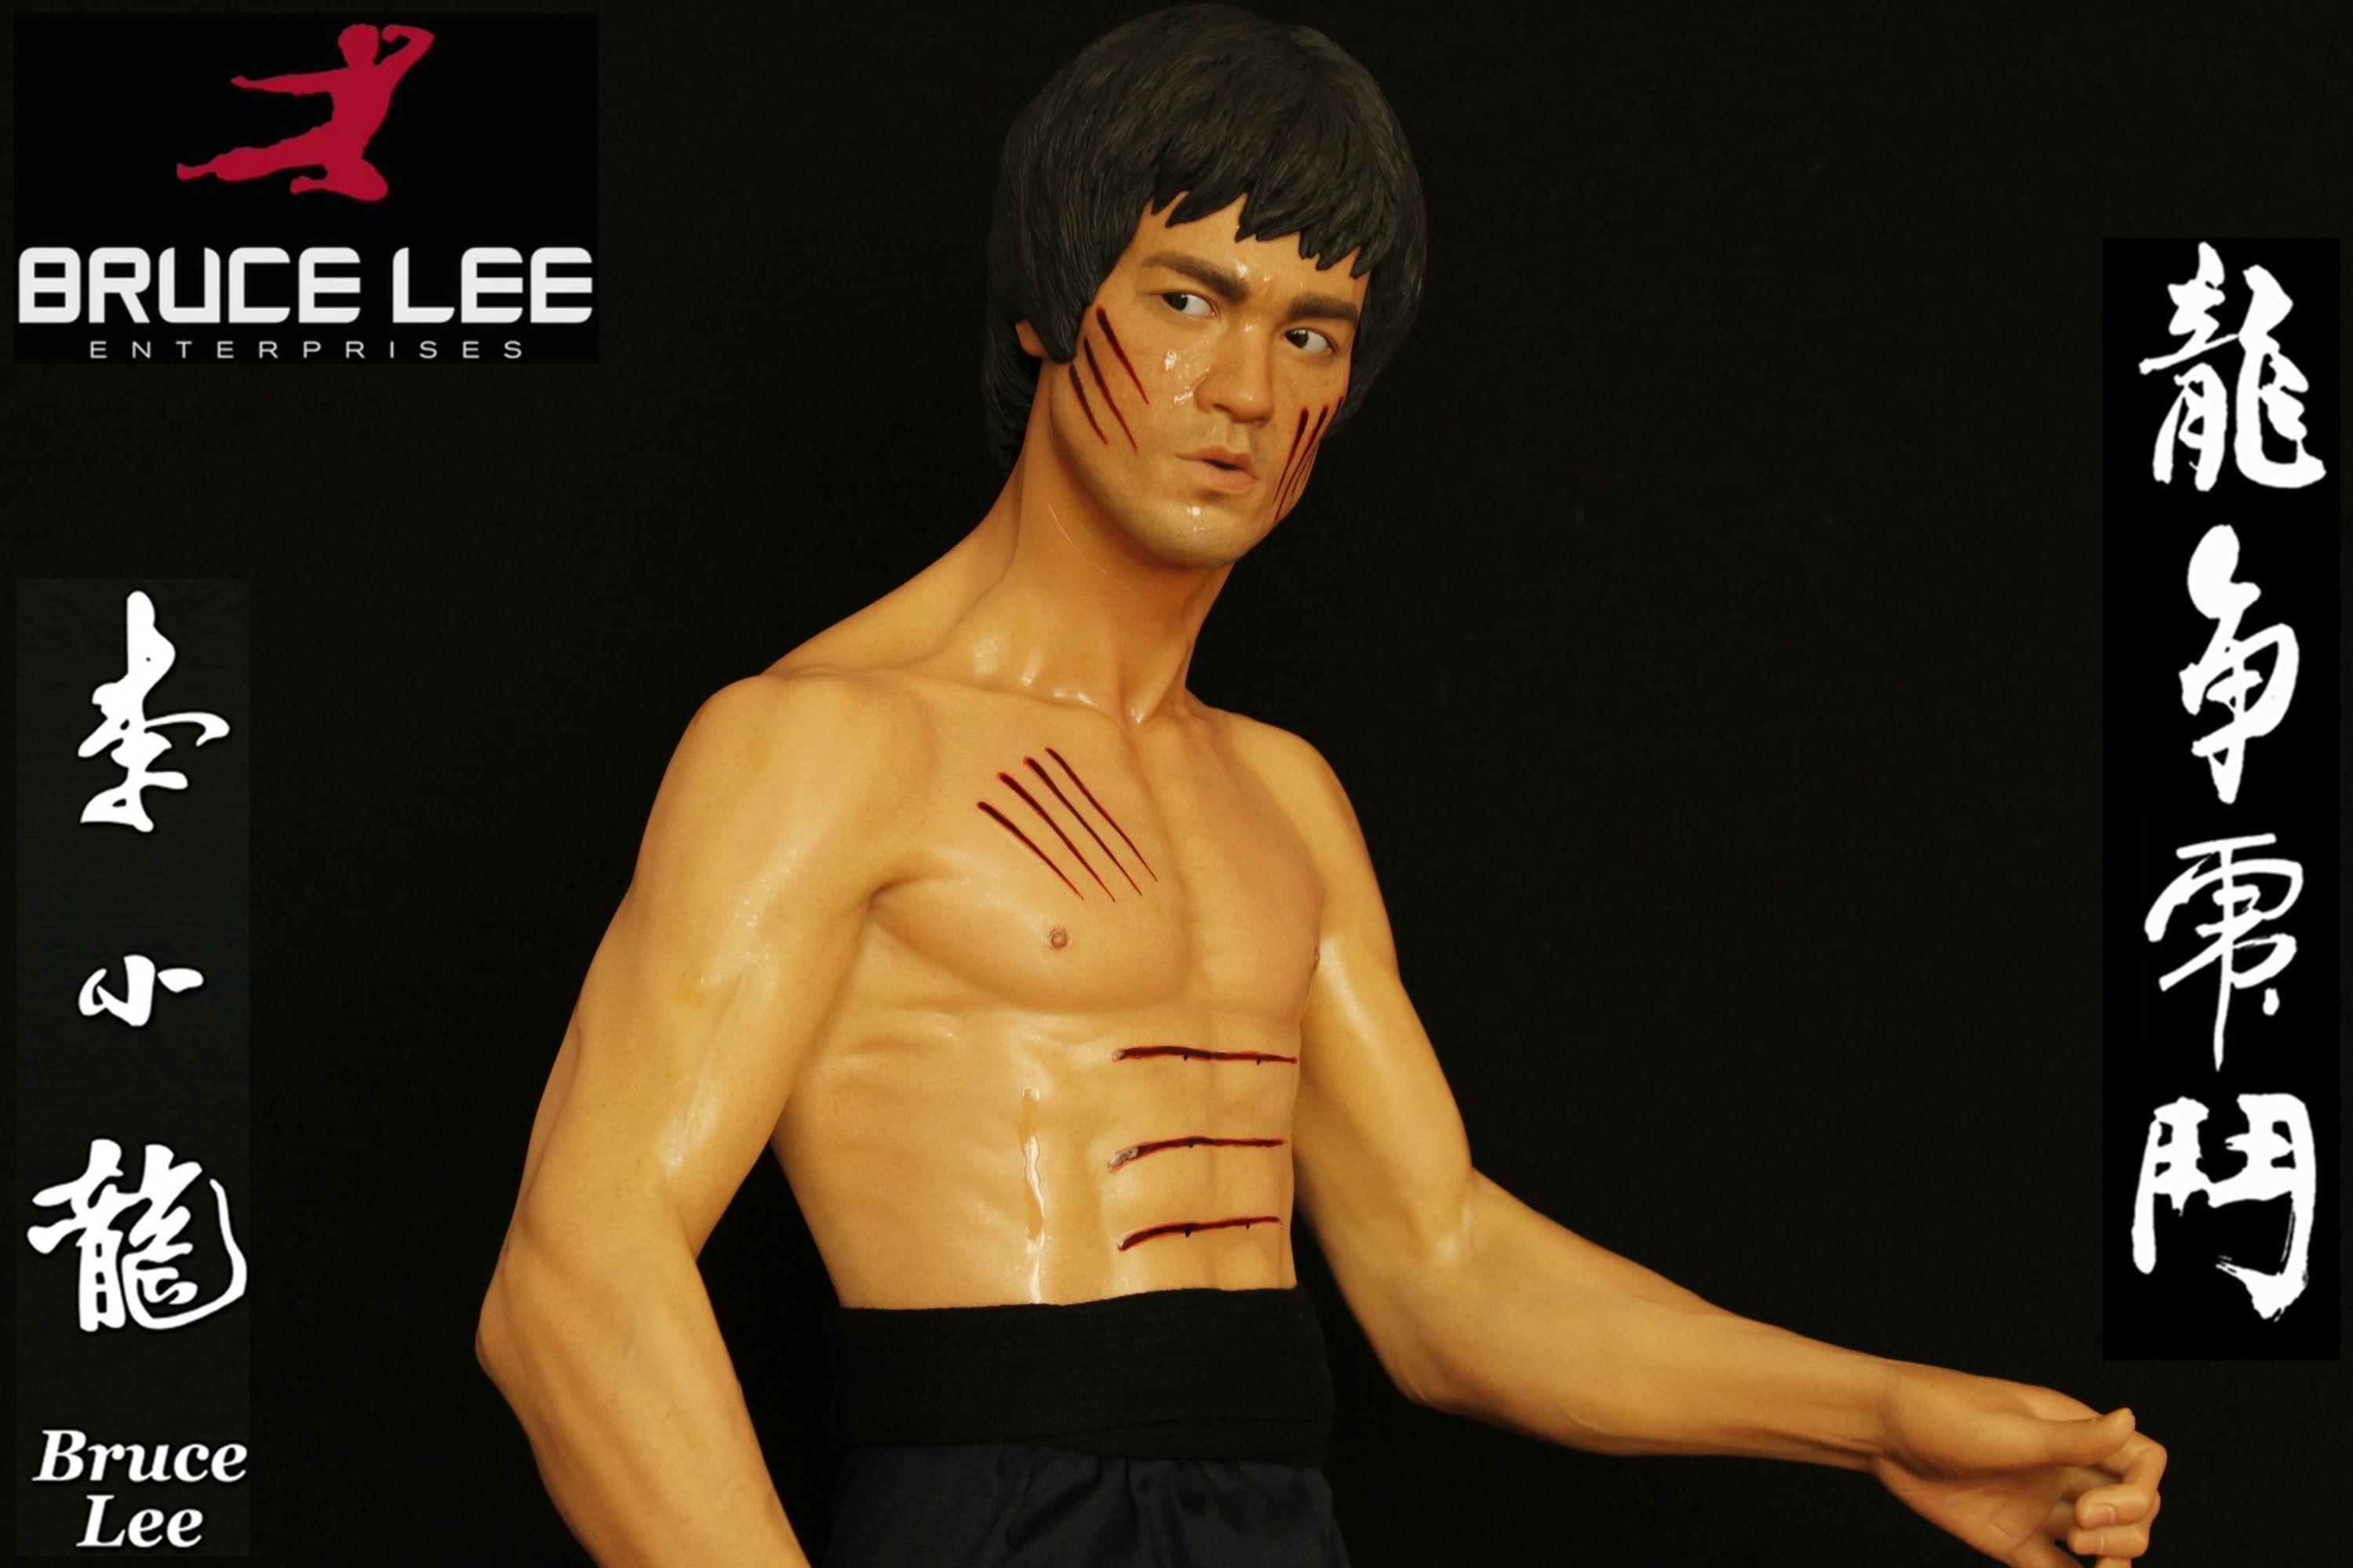 [Blitzway] Bruce Lee Tribute - 1/3 Scale - LANÇADO!!! - Página 6 212501yf2udf02gjj2x00m